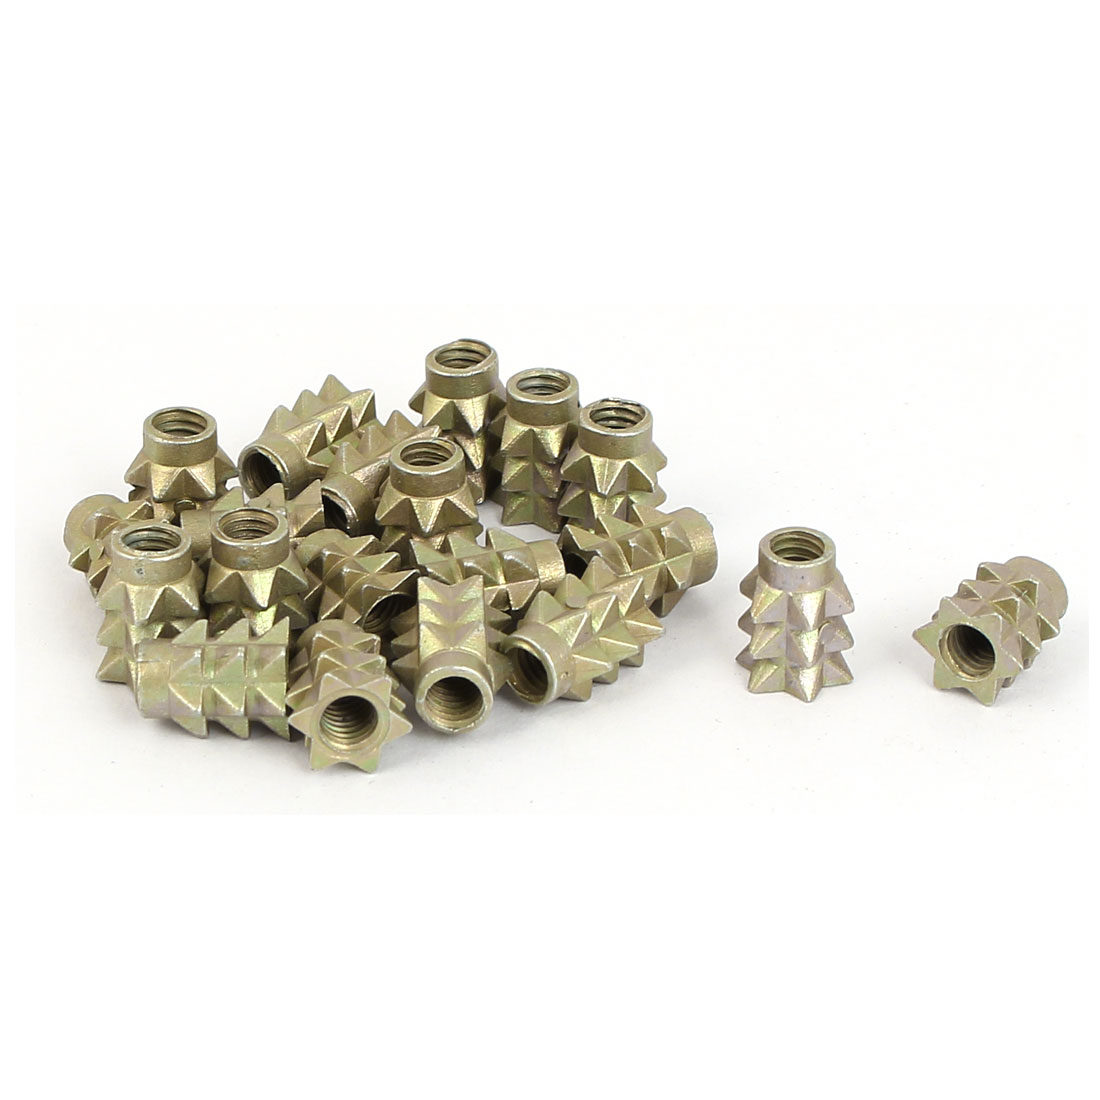 M4 x 10mm 0.7mm Thread Pitch Barbed Body Insert Nuts Fastener Bronze Tone 20 Pcs